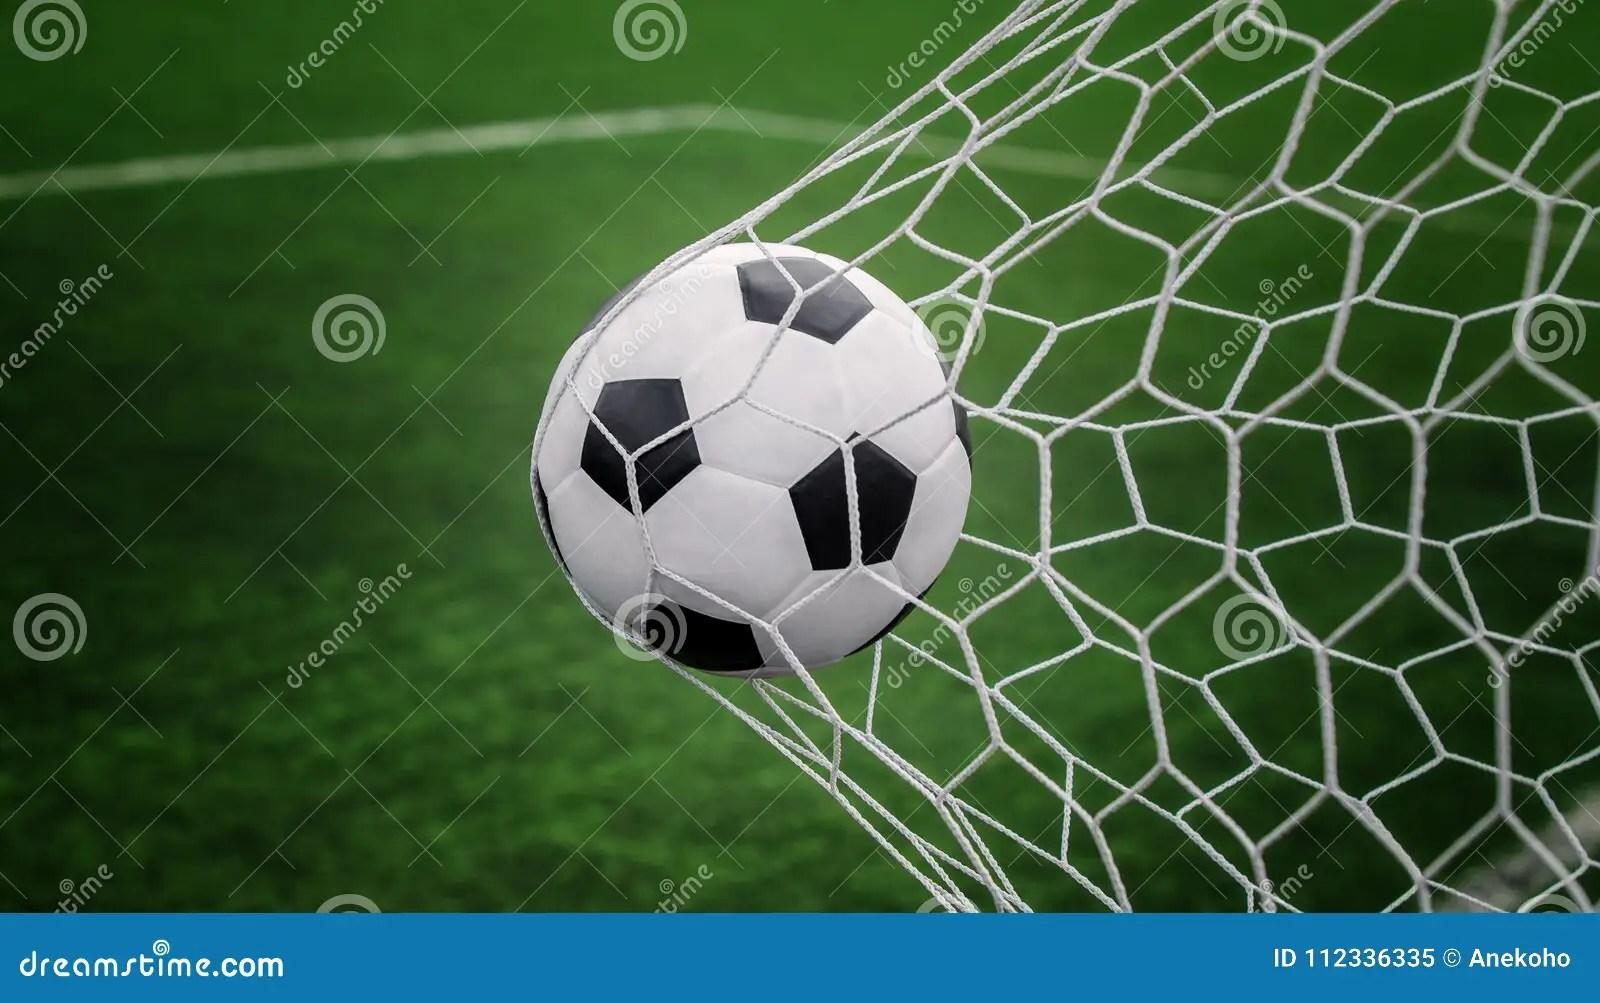 7 032 Soccer Net Background Photos